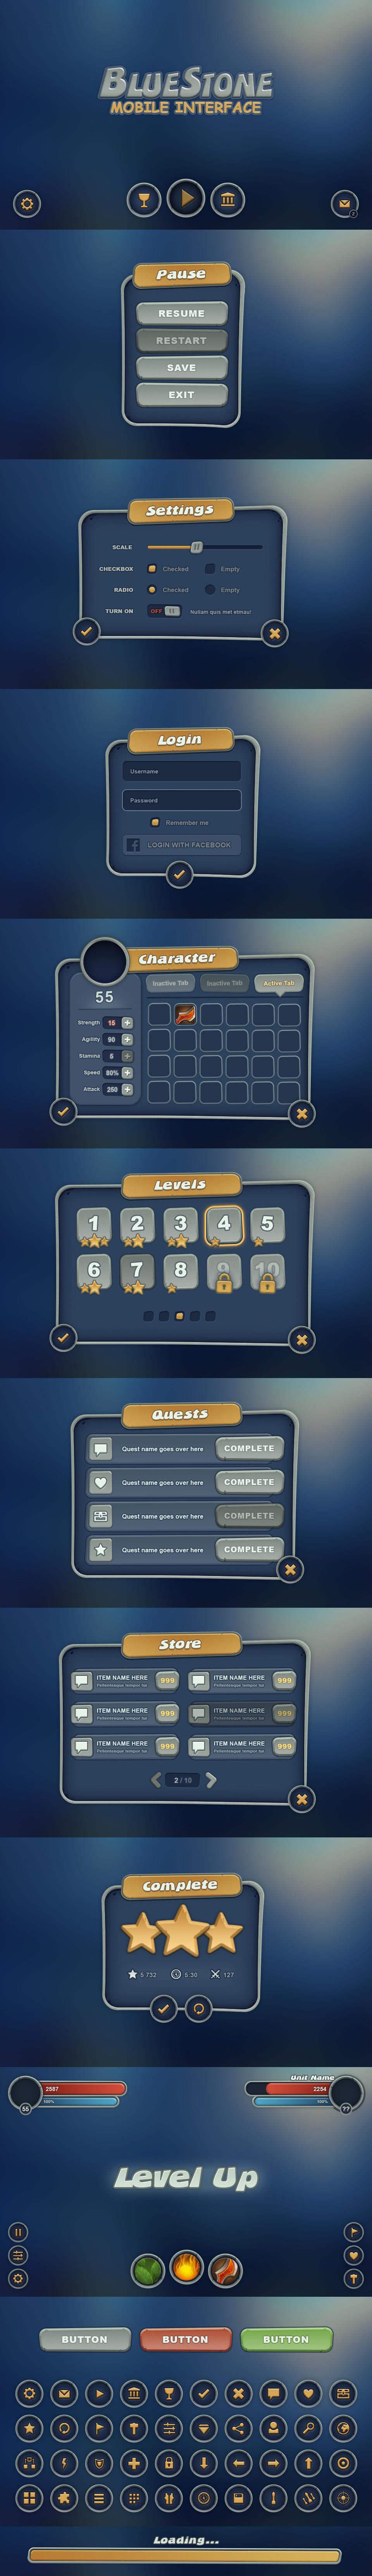 BlueStone Mobile UI by Evil-S